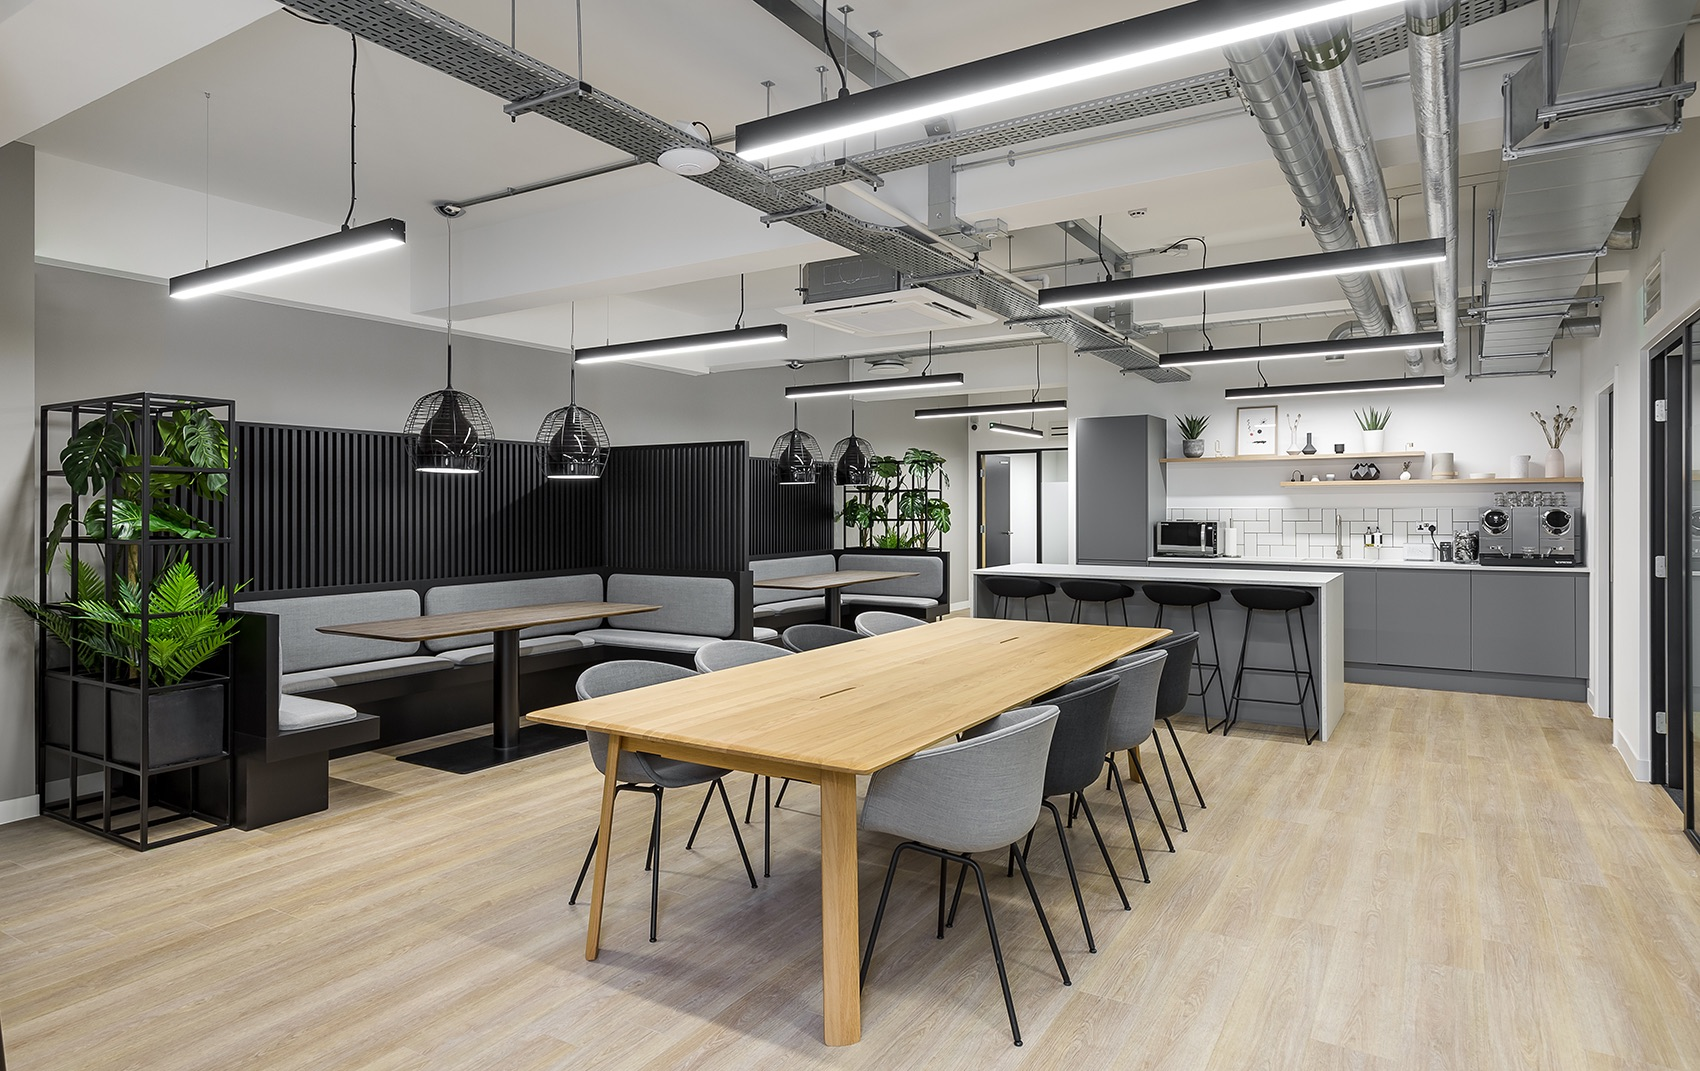 A Look Inside Newman Street's Office Building in London